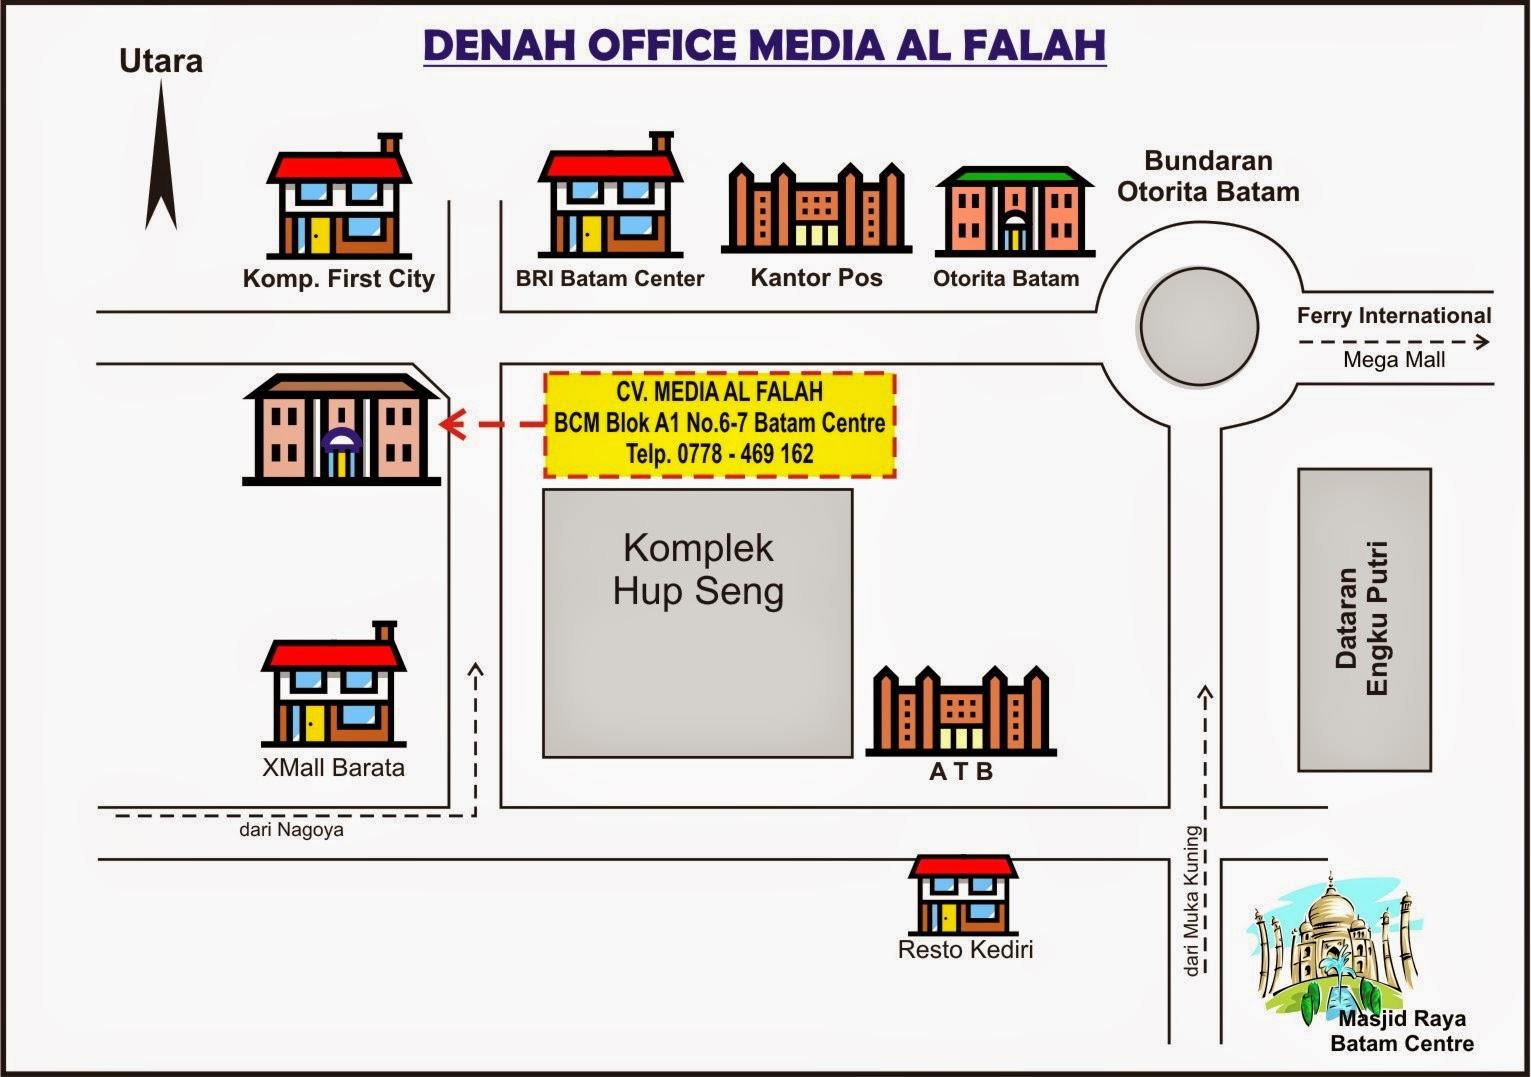 Contoh Soal Kelas 4 Sd Bahasa Indonesia Semester 1